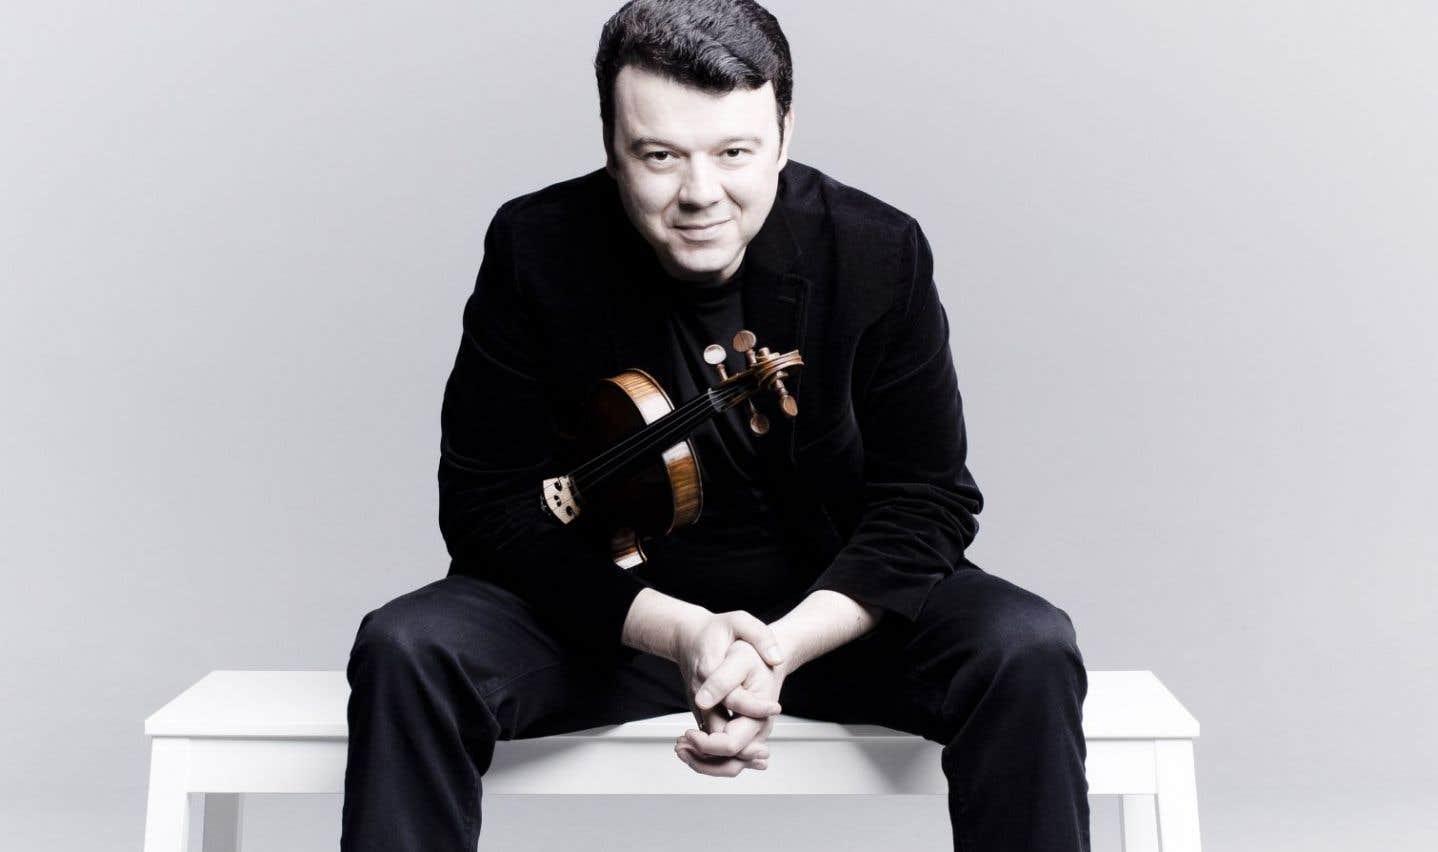 Le violoniste Vadim Gluzman